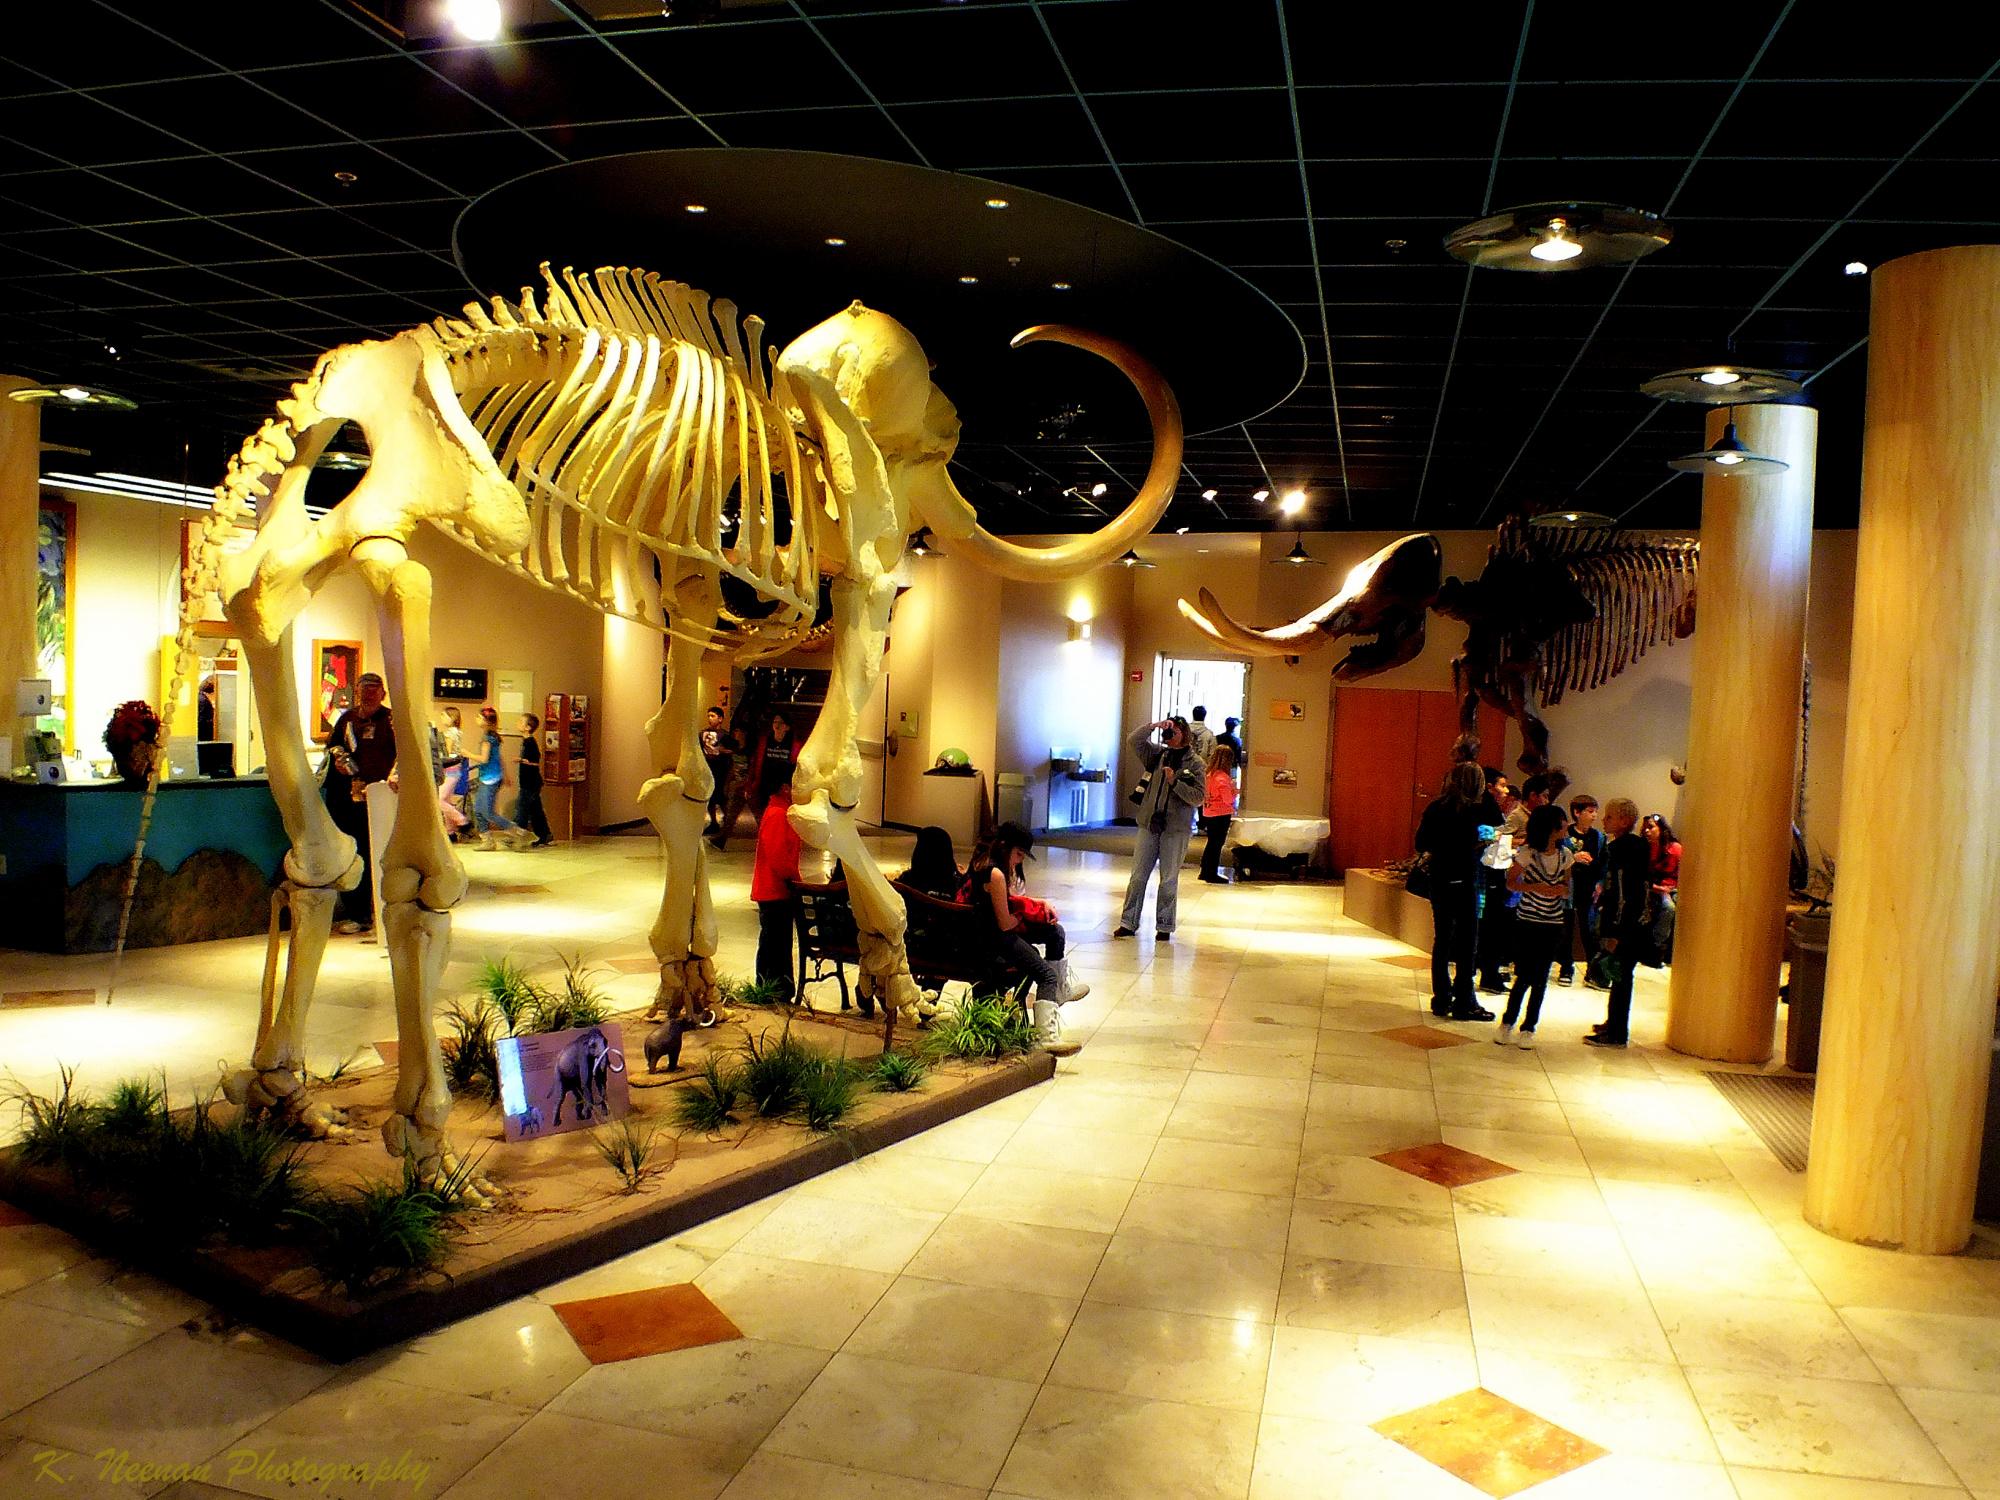 File:Arizona Museum of Natural History Lobby.jpg - Wikimedia Commons